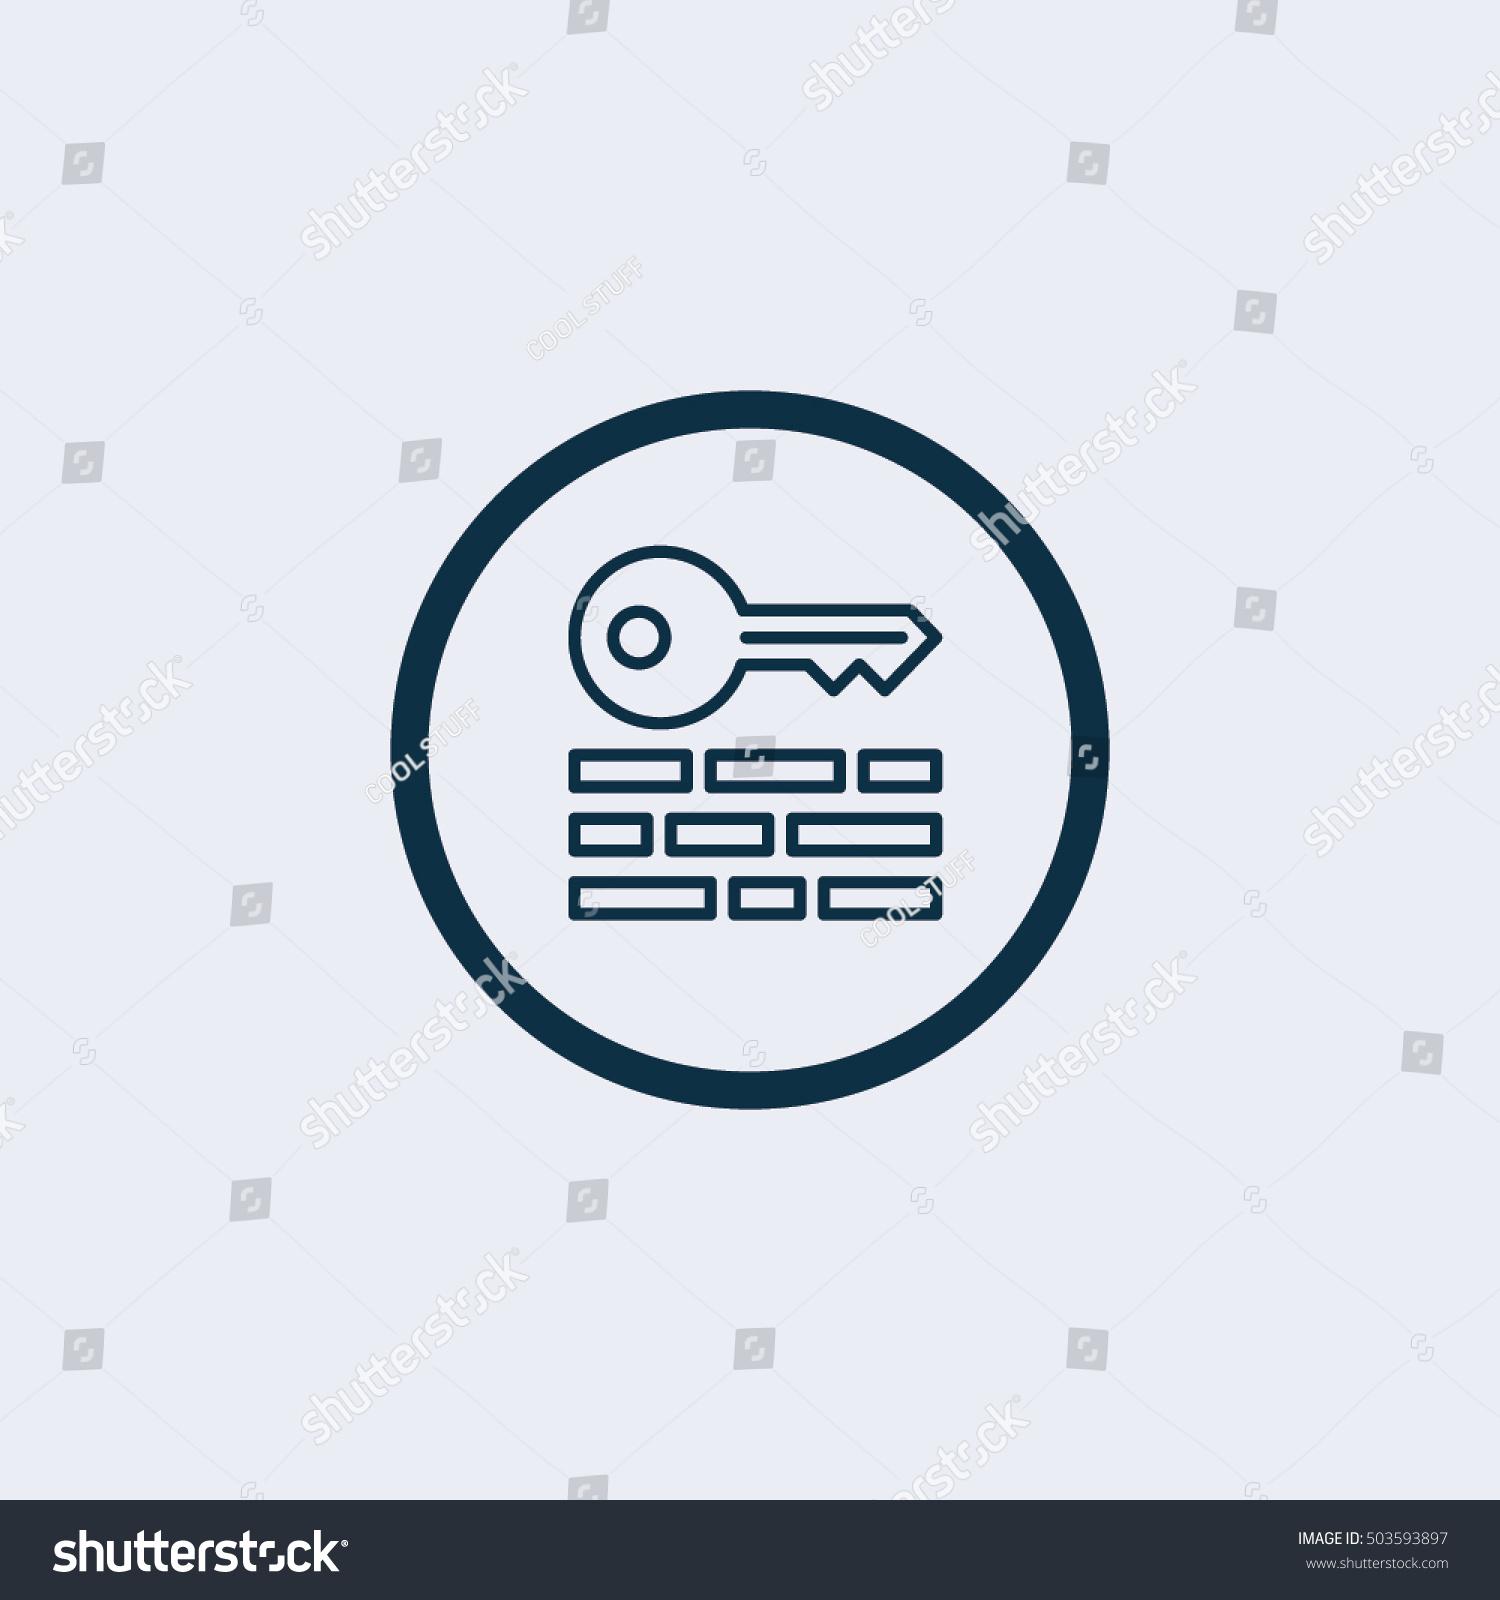 Key Symbol Iconkeyword Icon Icon Stock Vector 2018 503593897